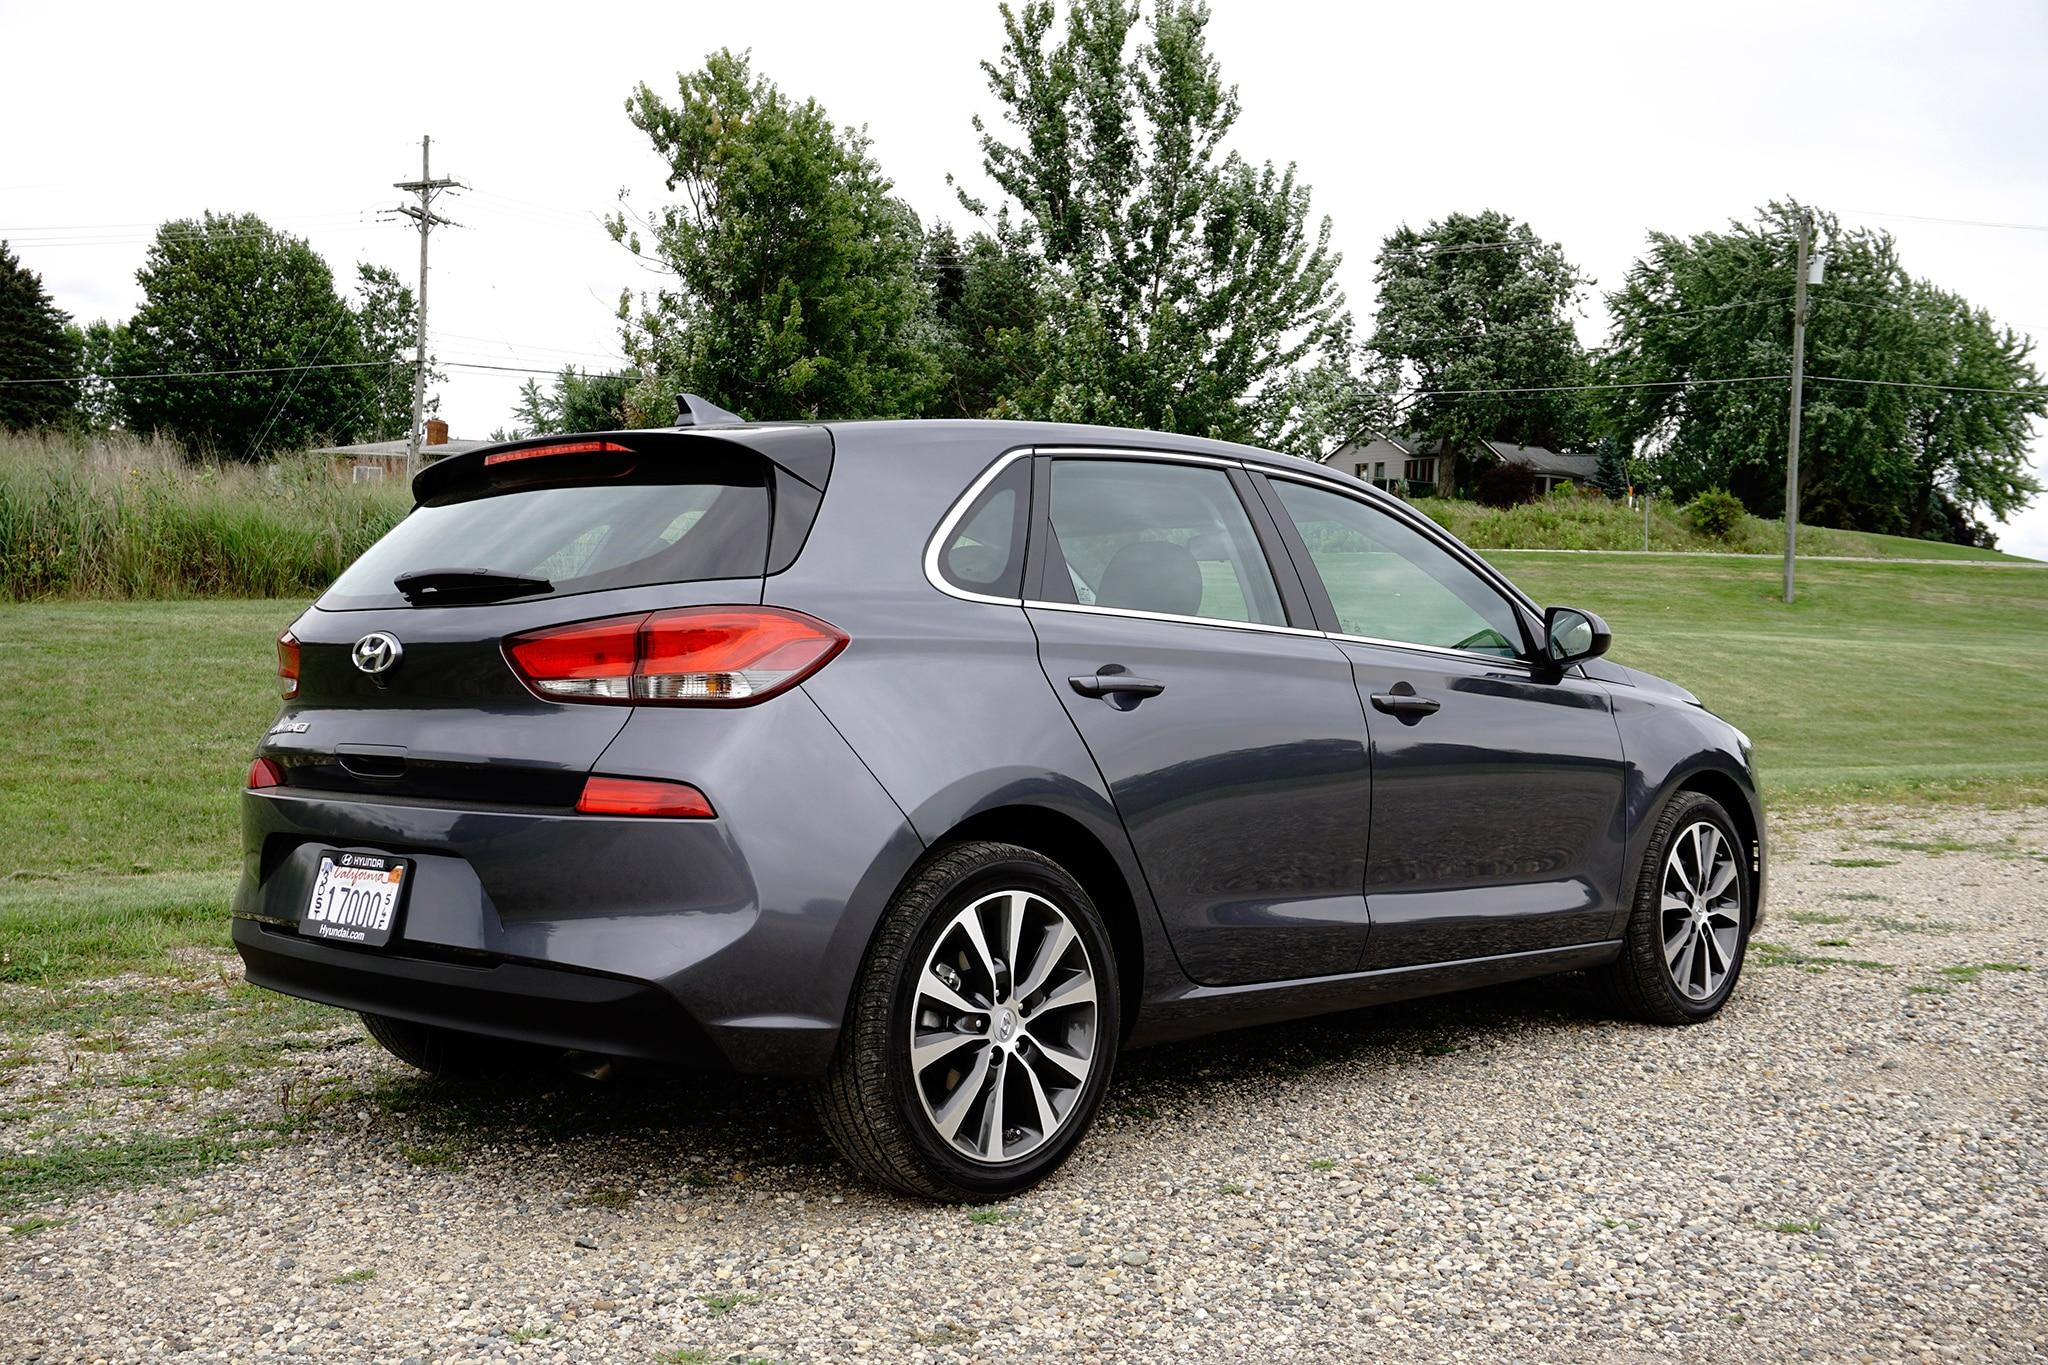 2018 Hyundai Elantra GT Sport First Drive Review | Automobile Magazine